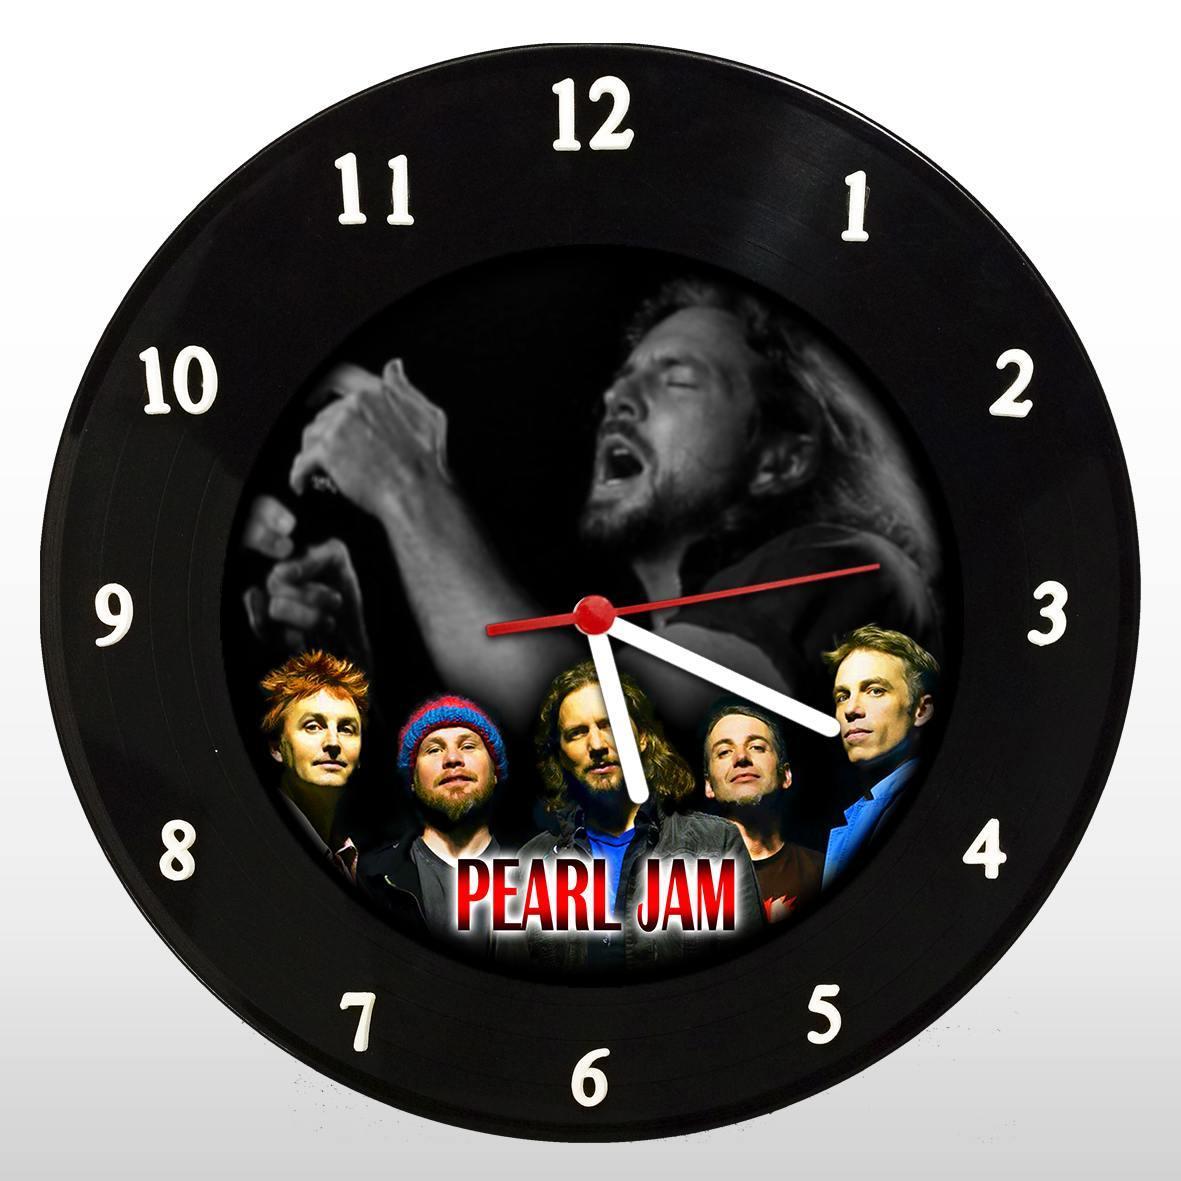 Pearl Jam - Relógio de Parede em Disco de Vinil - Mr. Rock